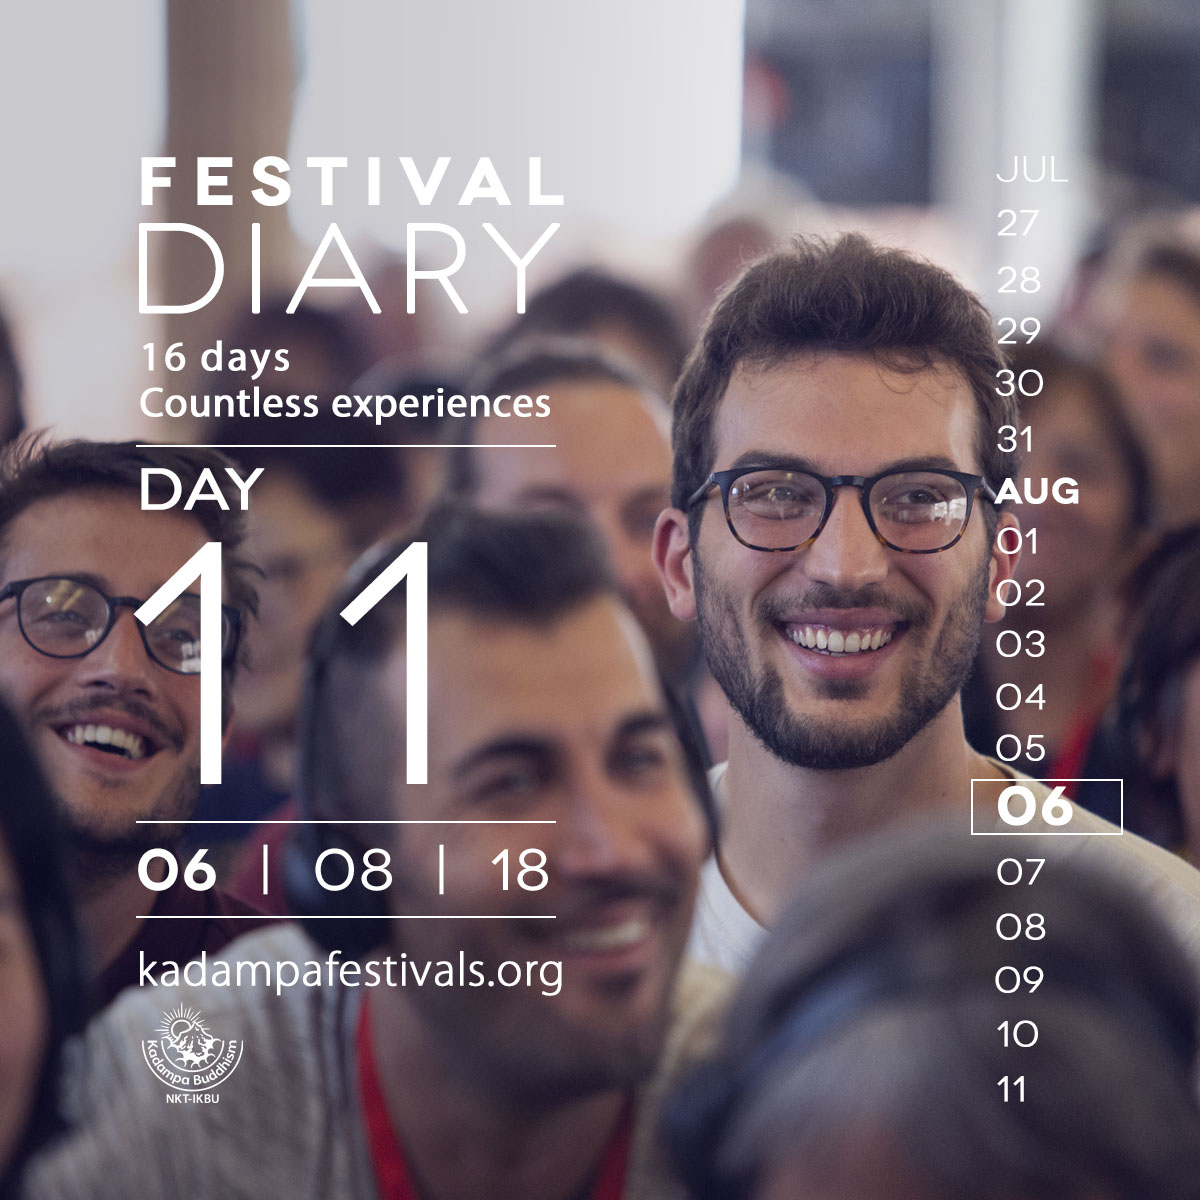 2018-07-26-festival diary-11-m